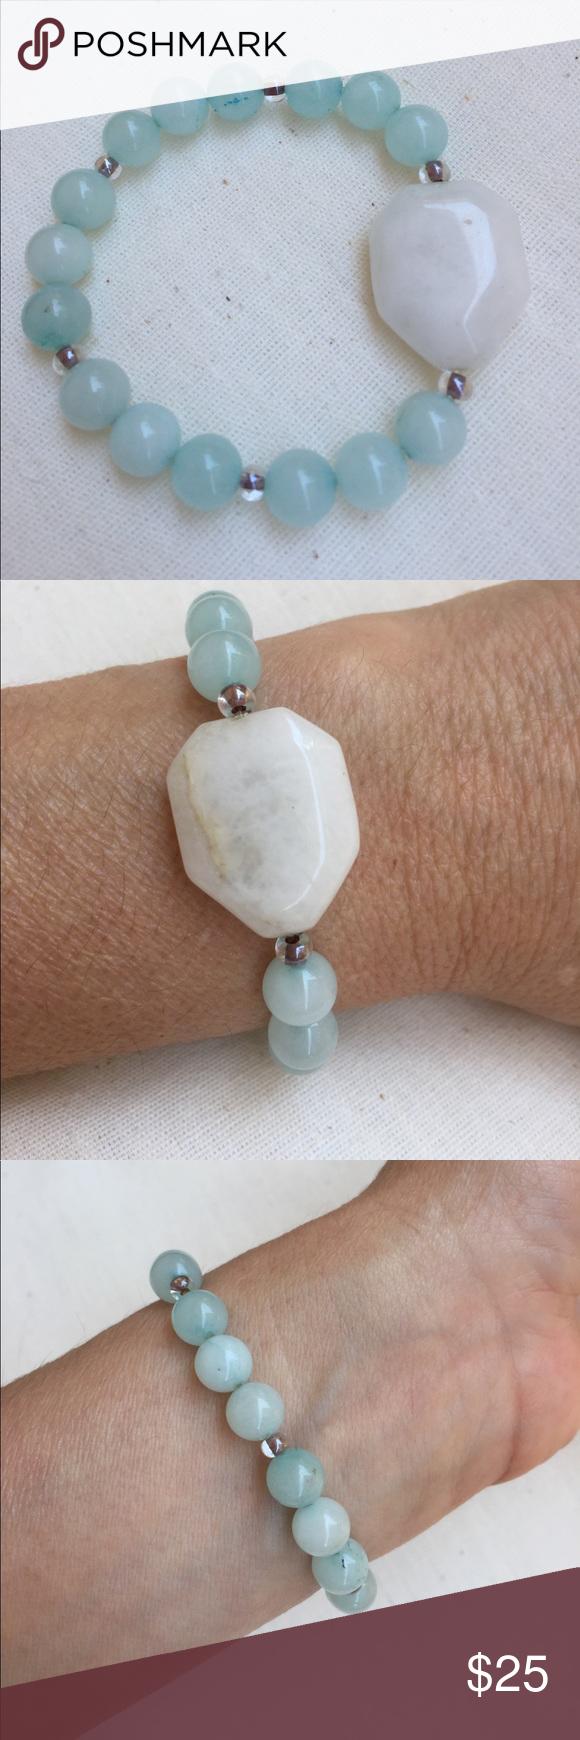 Beautiful white quartz bracelet with glass beads white quartz